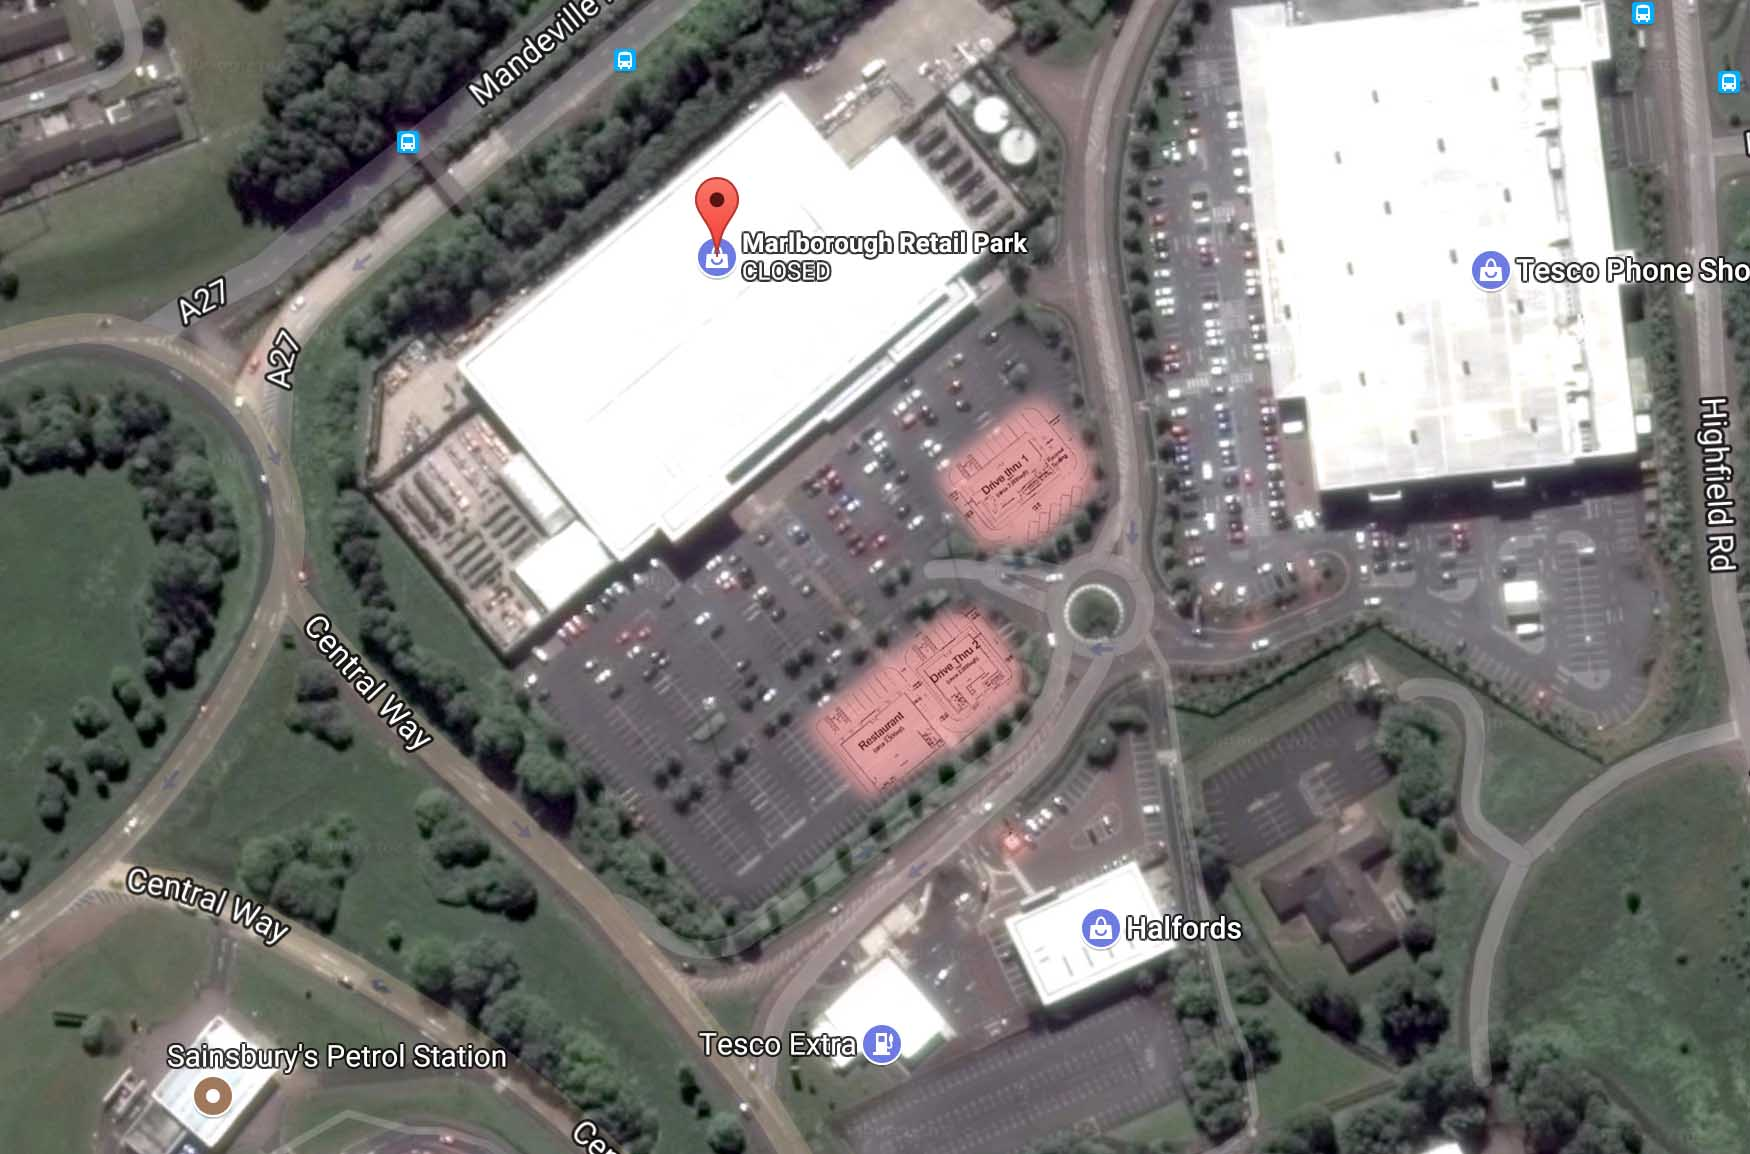 Marlborough Retail Park Plans